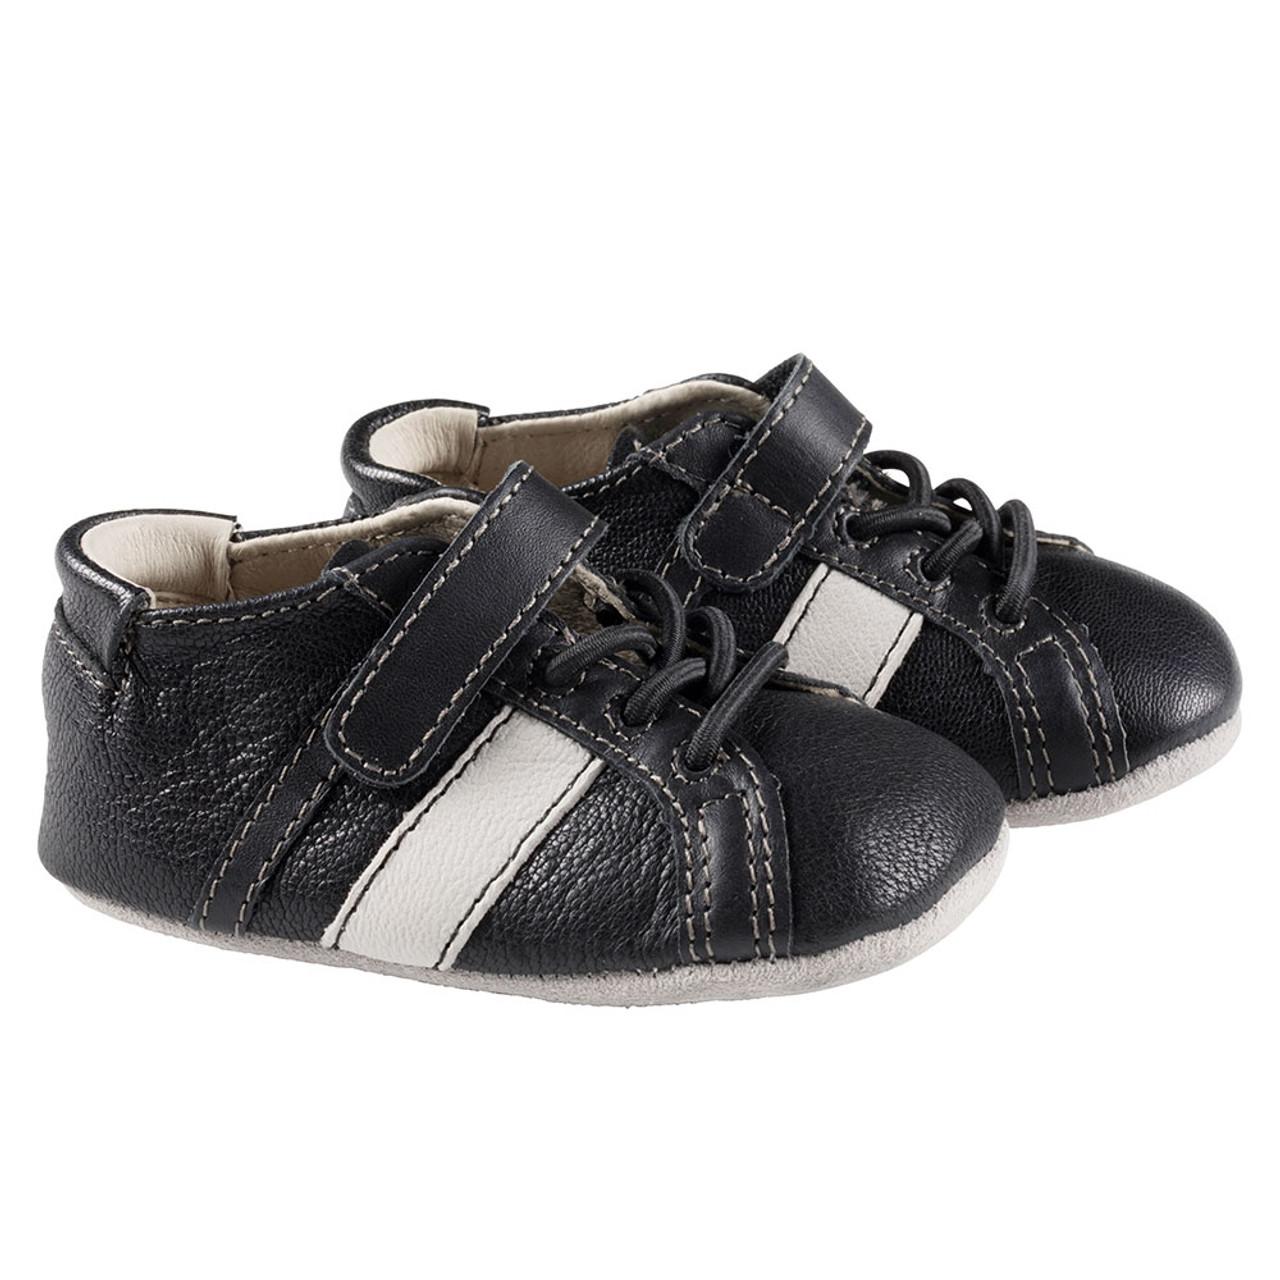 Robeez Black Rowan First Kicks - Angle 57872aa93fb